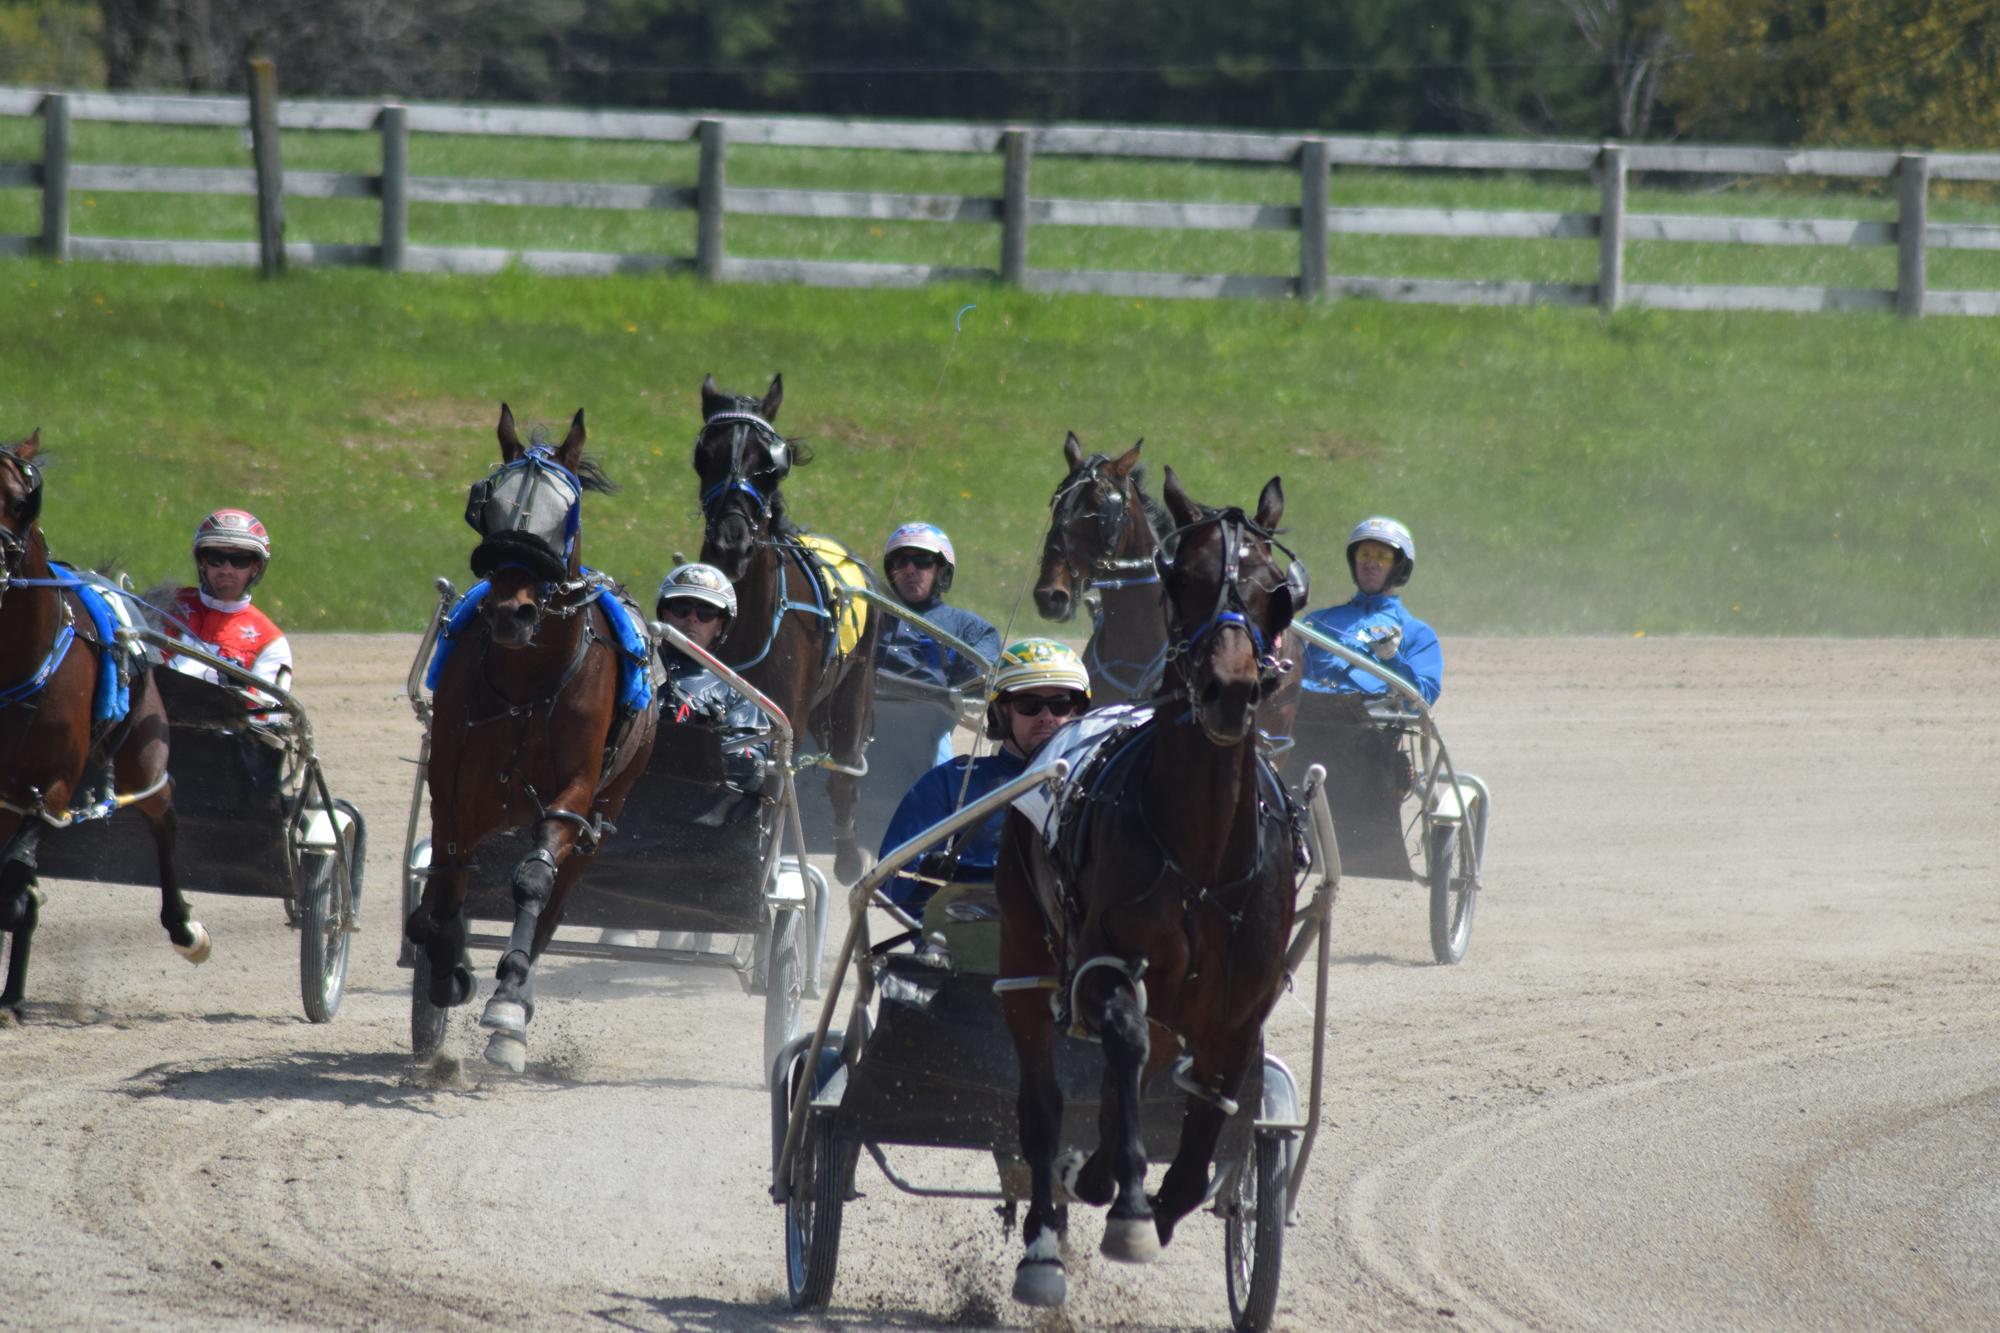 horse racing harness standardbred